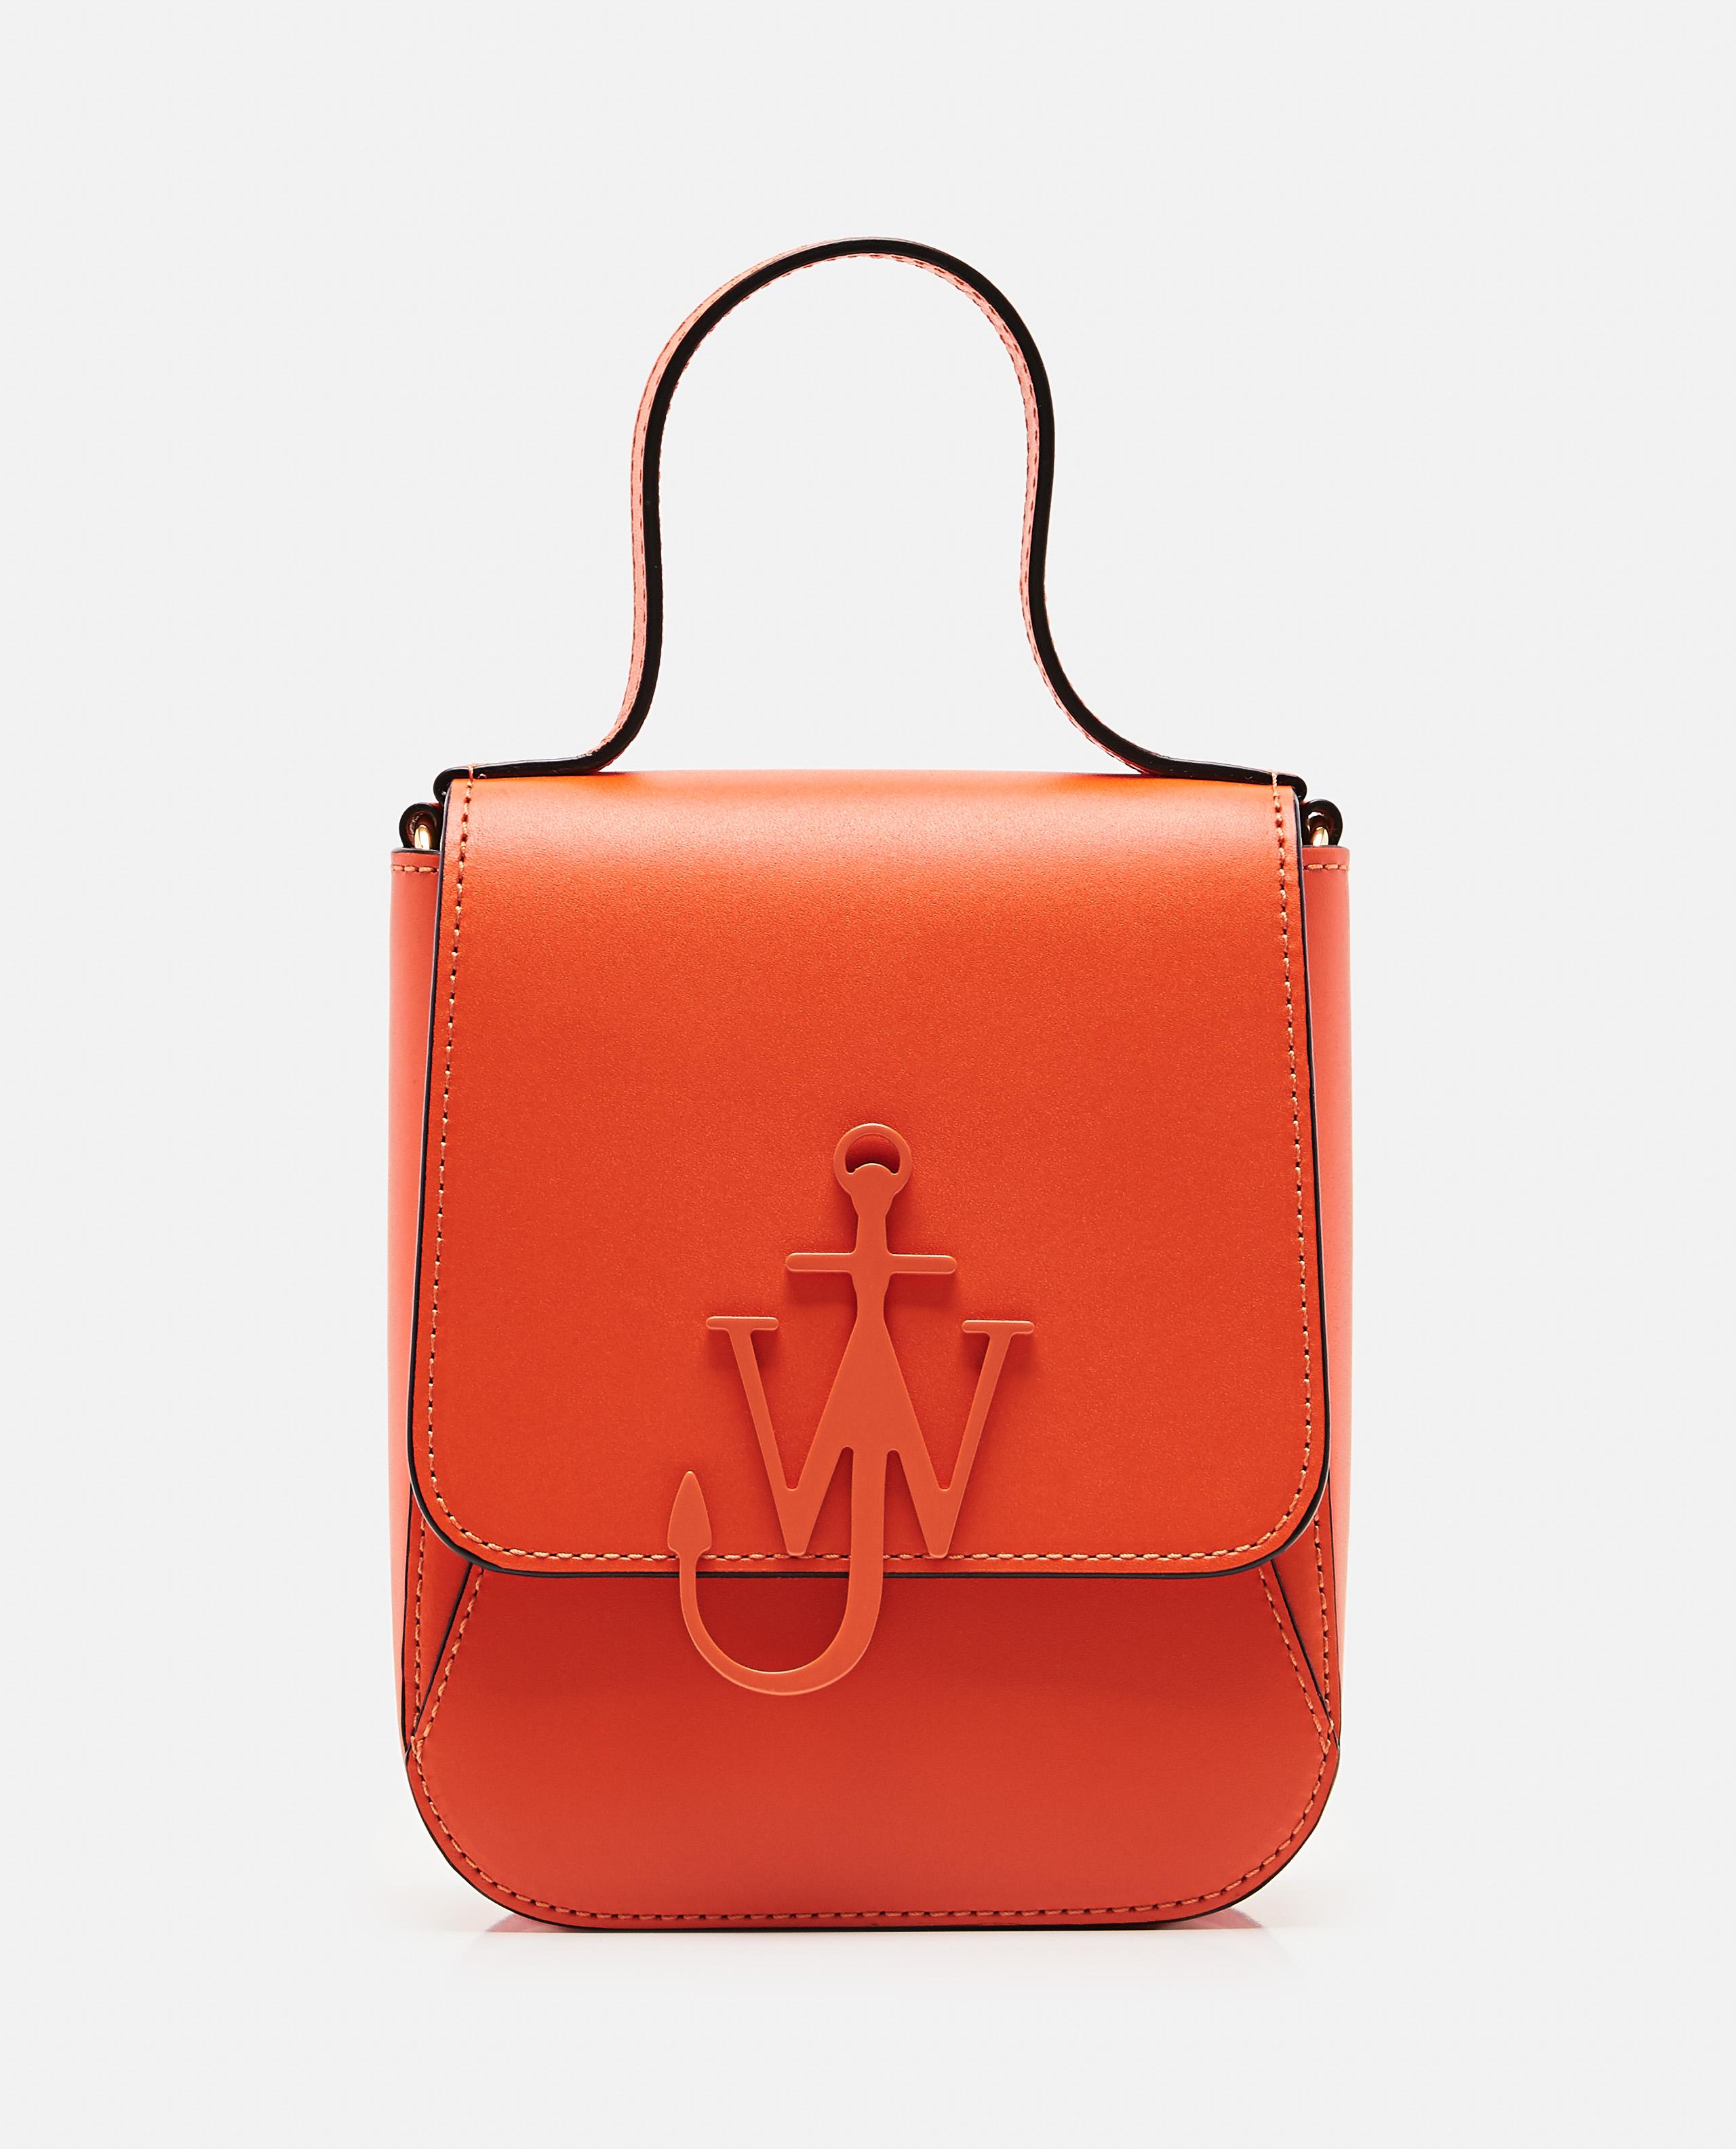 Anchor top handle bag